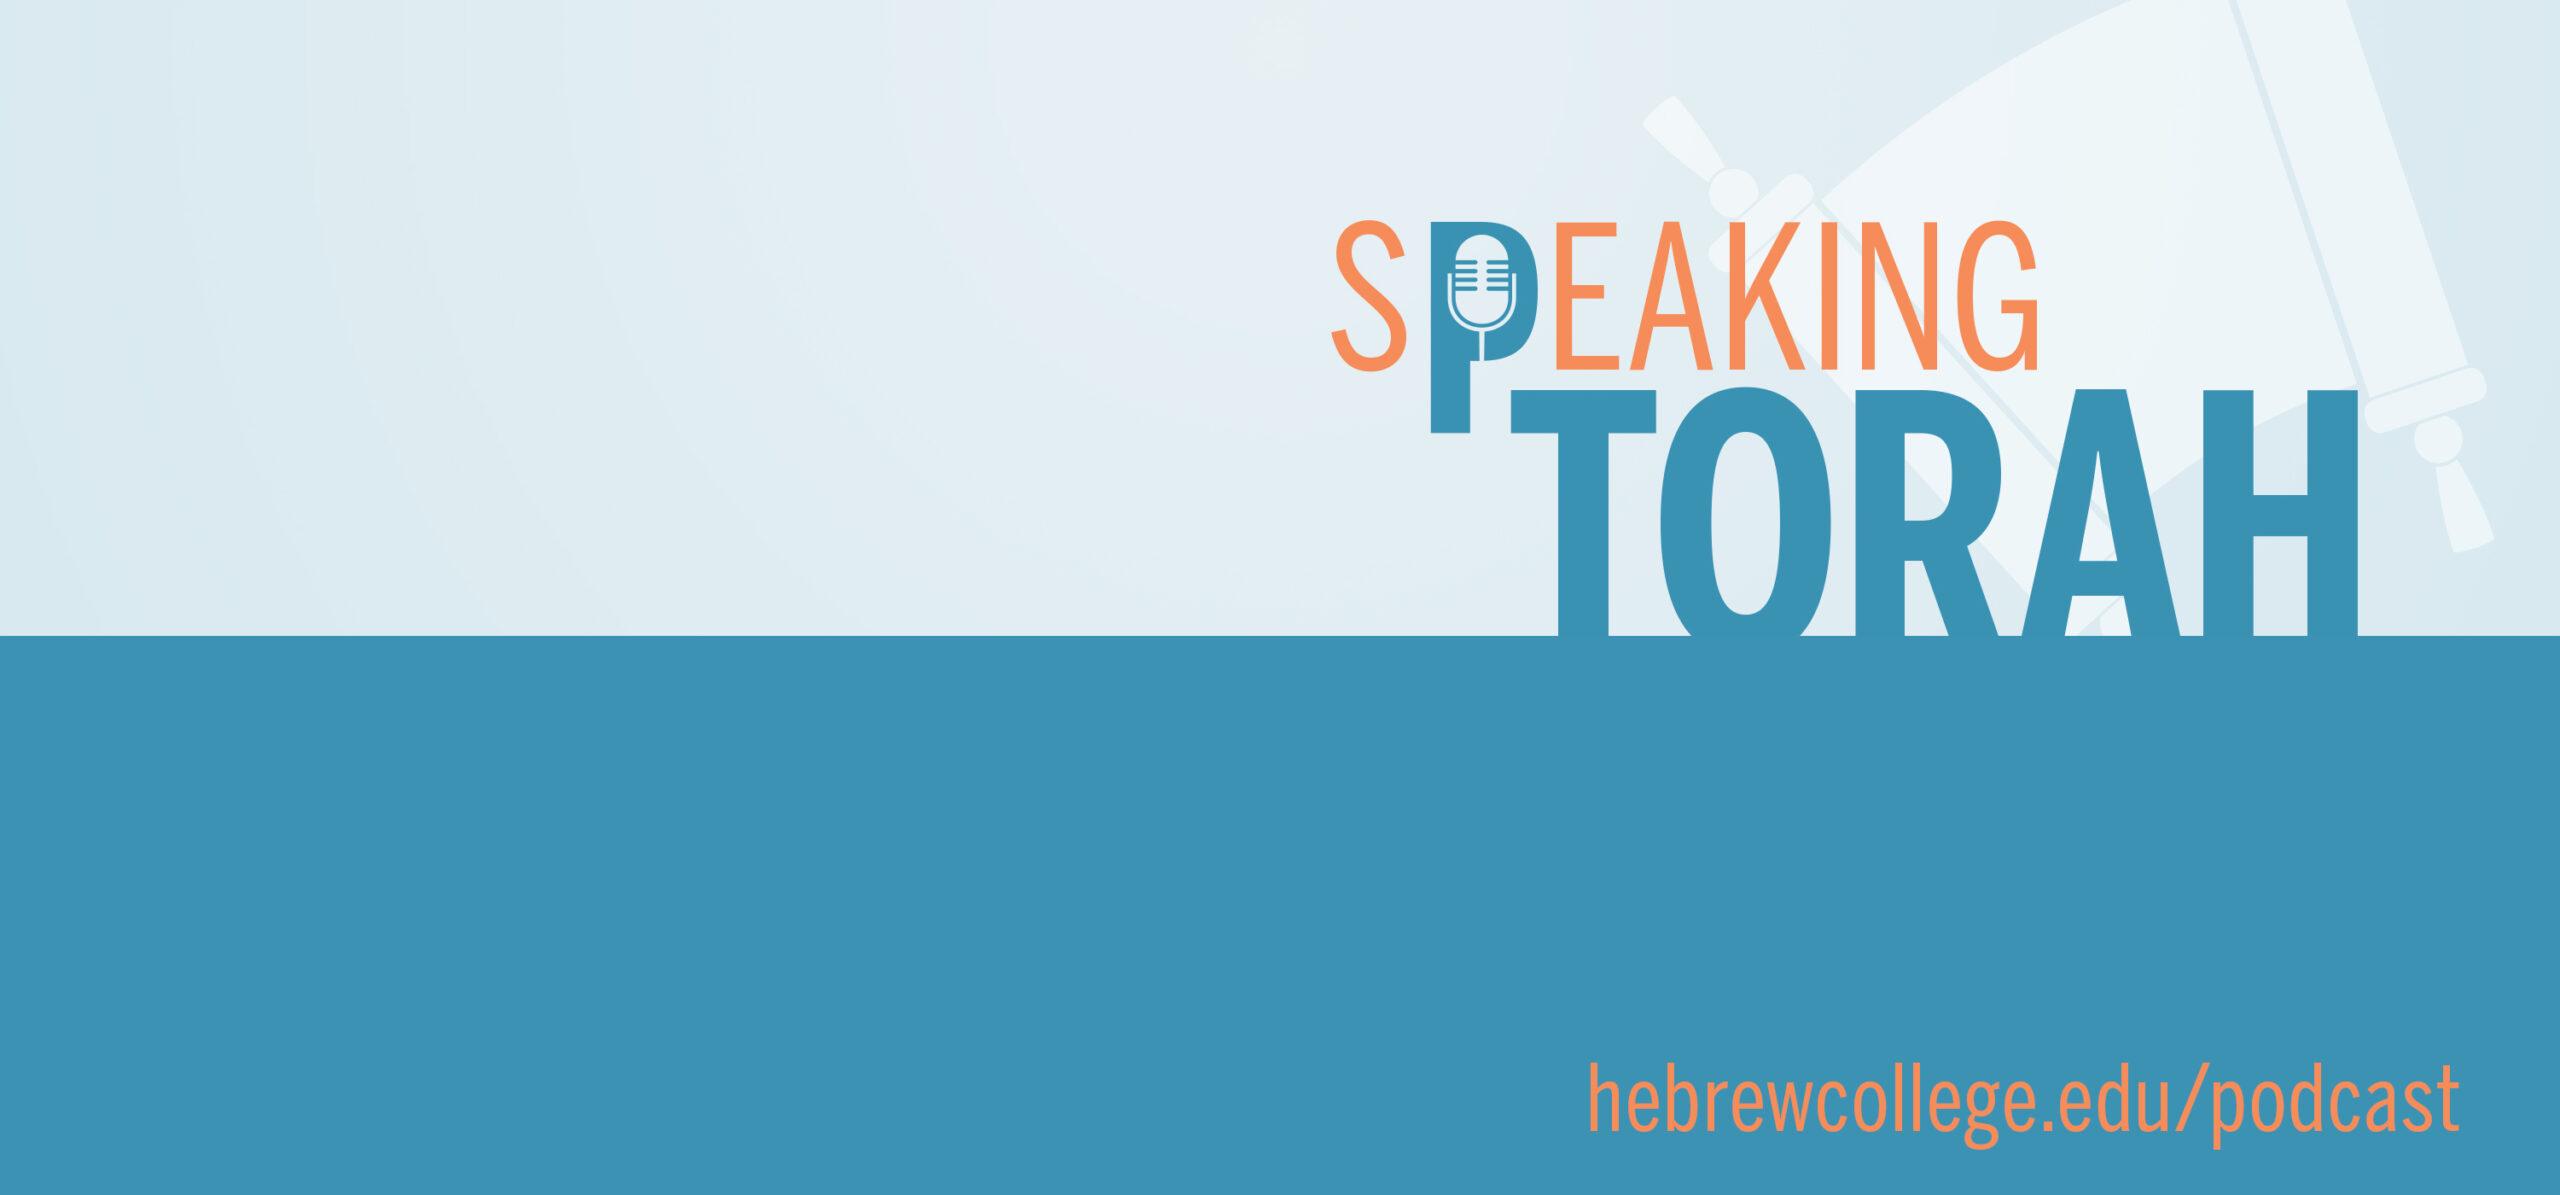 SpeakingTorah_PodcastArt - announcement art